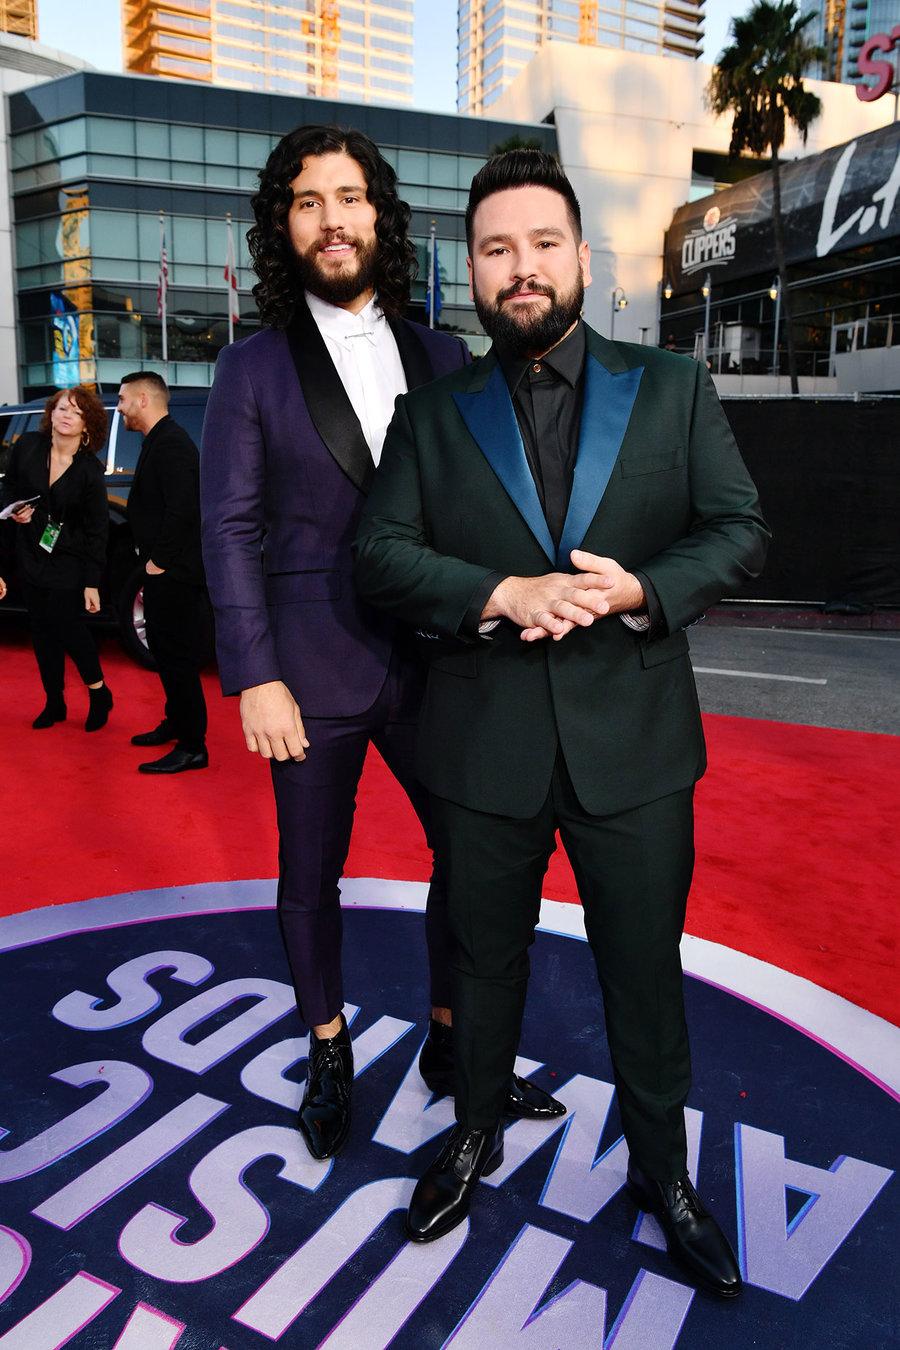 Dan Shay 2019AmericanMusicAwards - American Music Awards 2019: Фотографии с красной дорожки